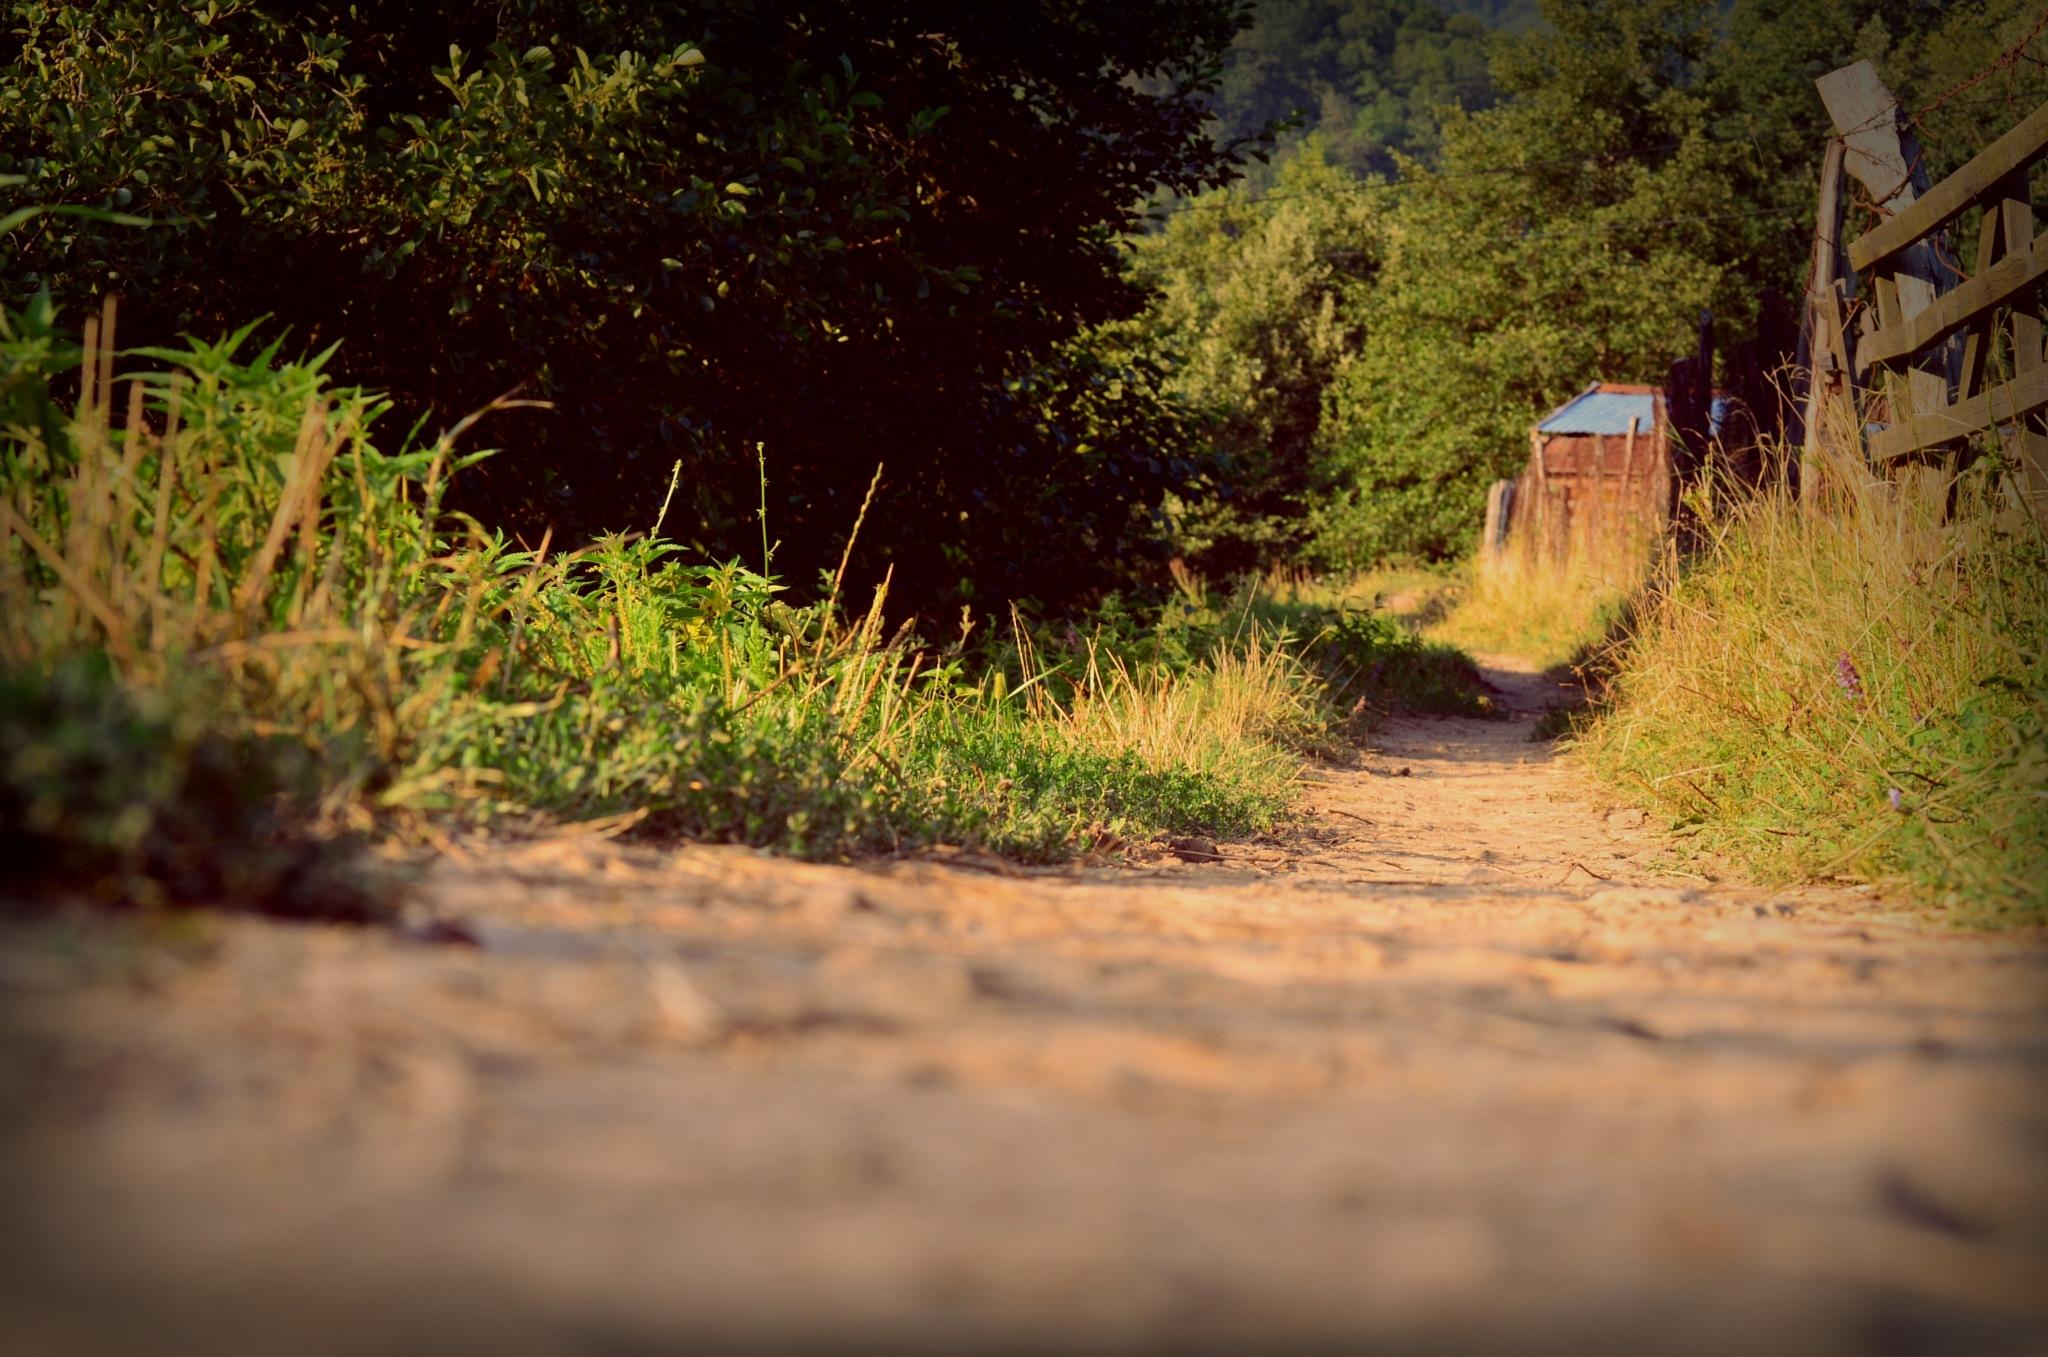 Path by SizredMCMXCIV